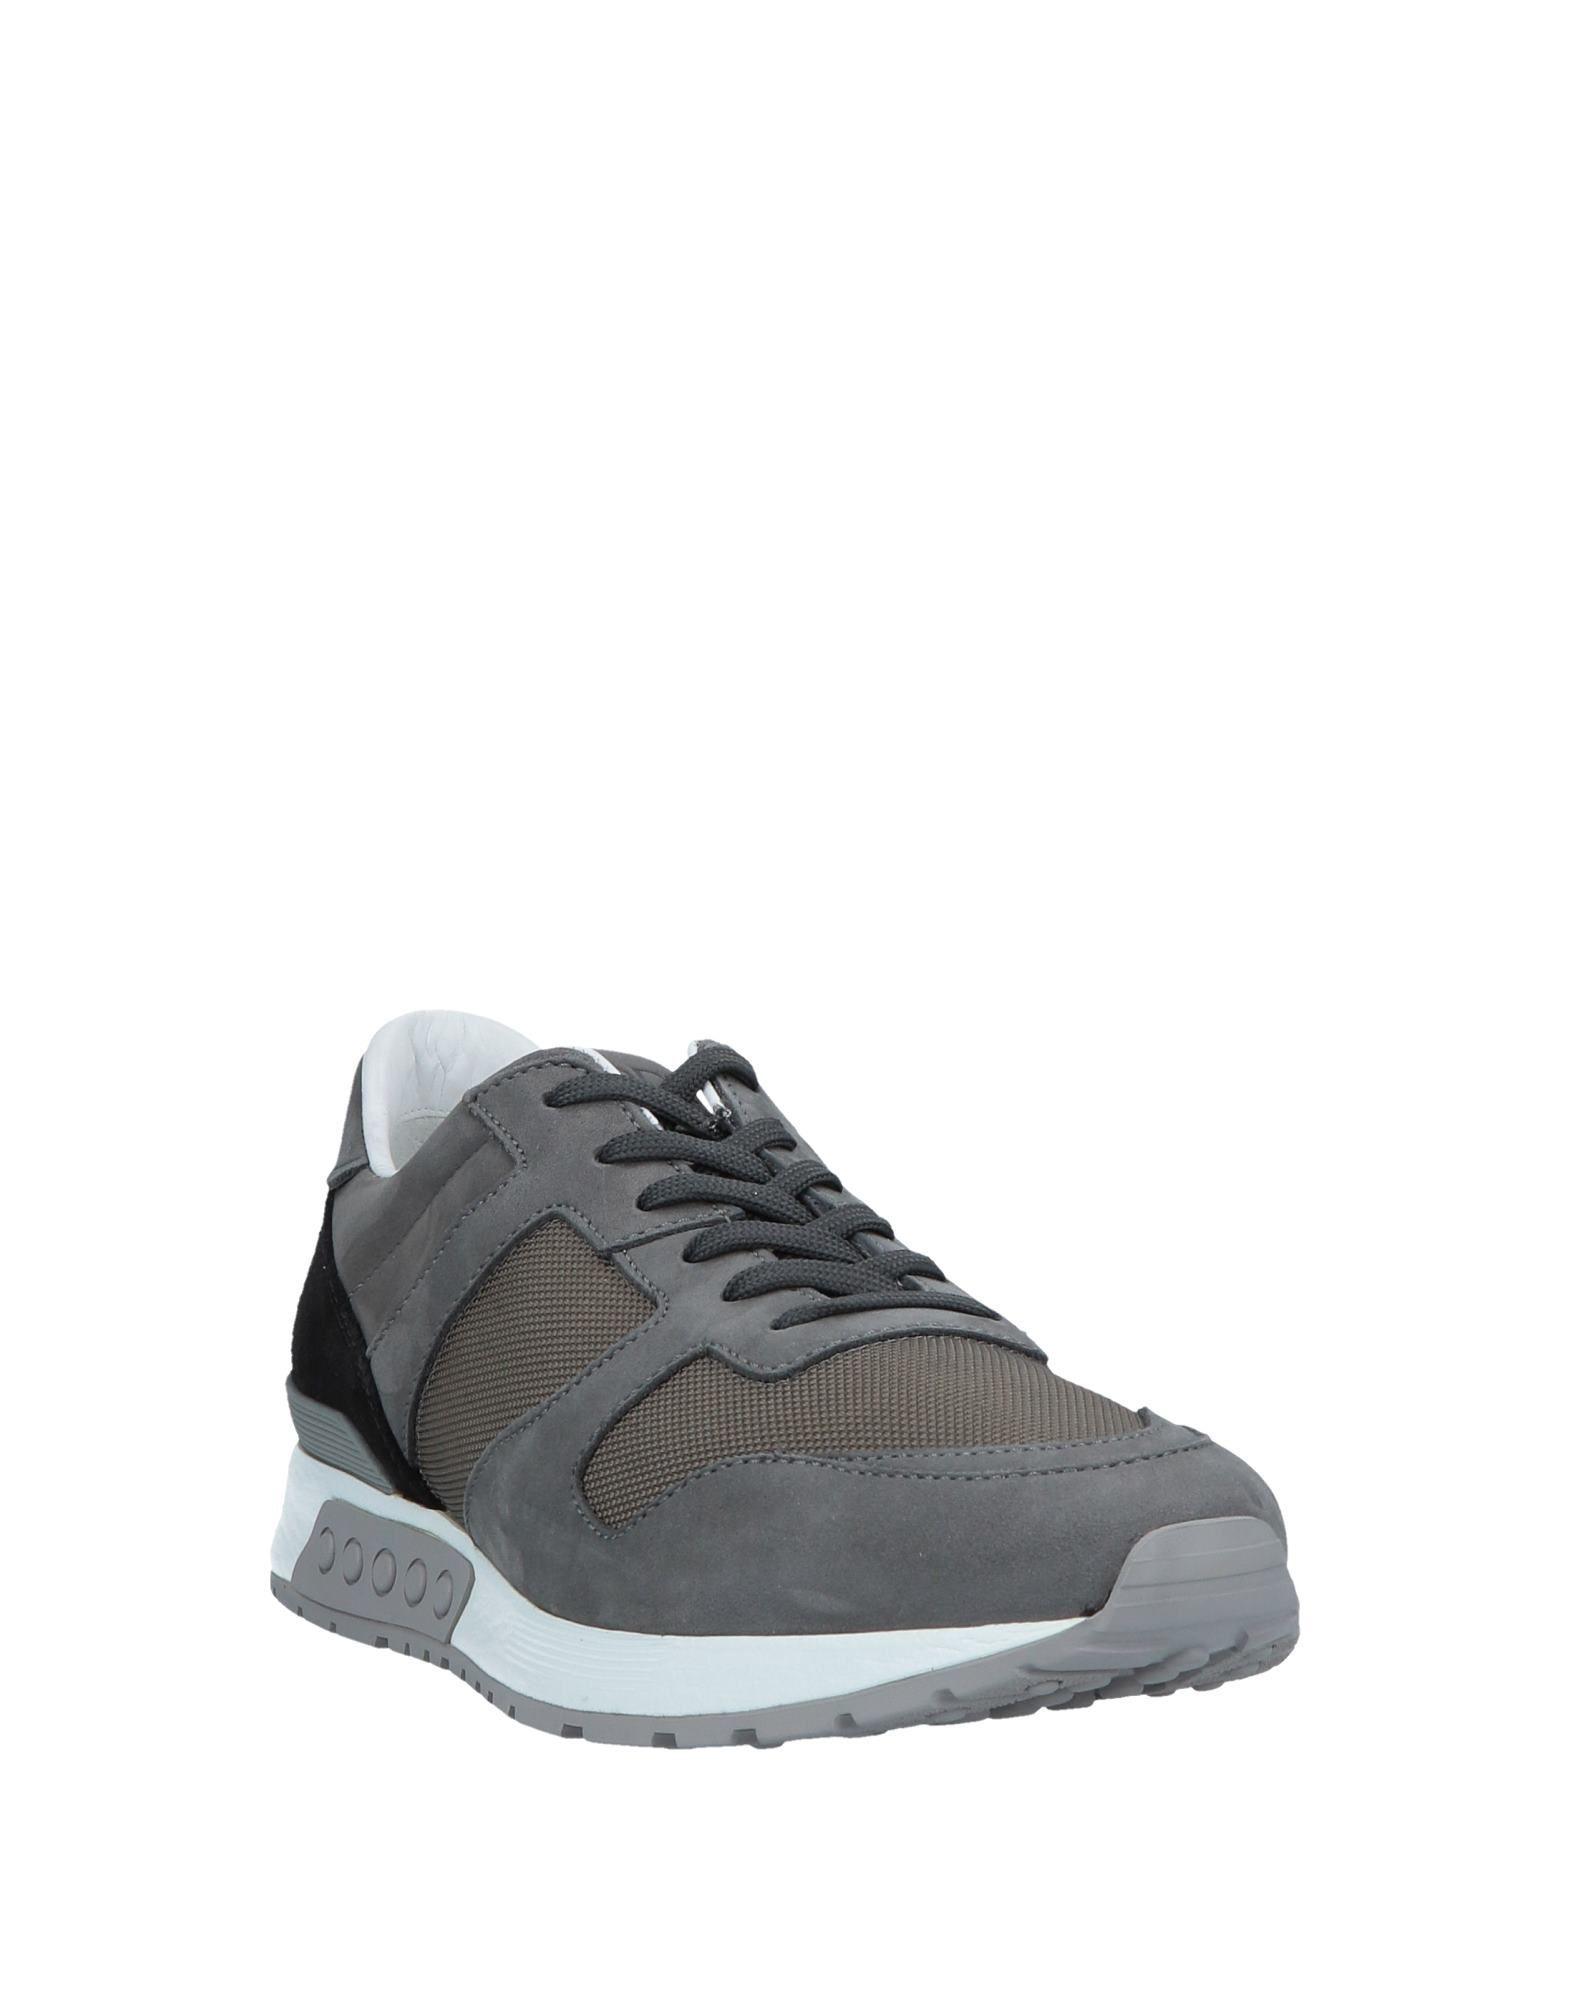 Tod's Leder Low Sneakers & Tennisschuhe in Grau für Herren qBWBa